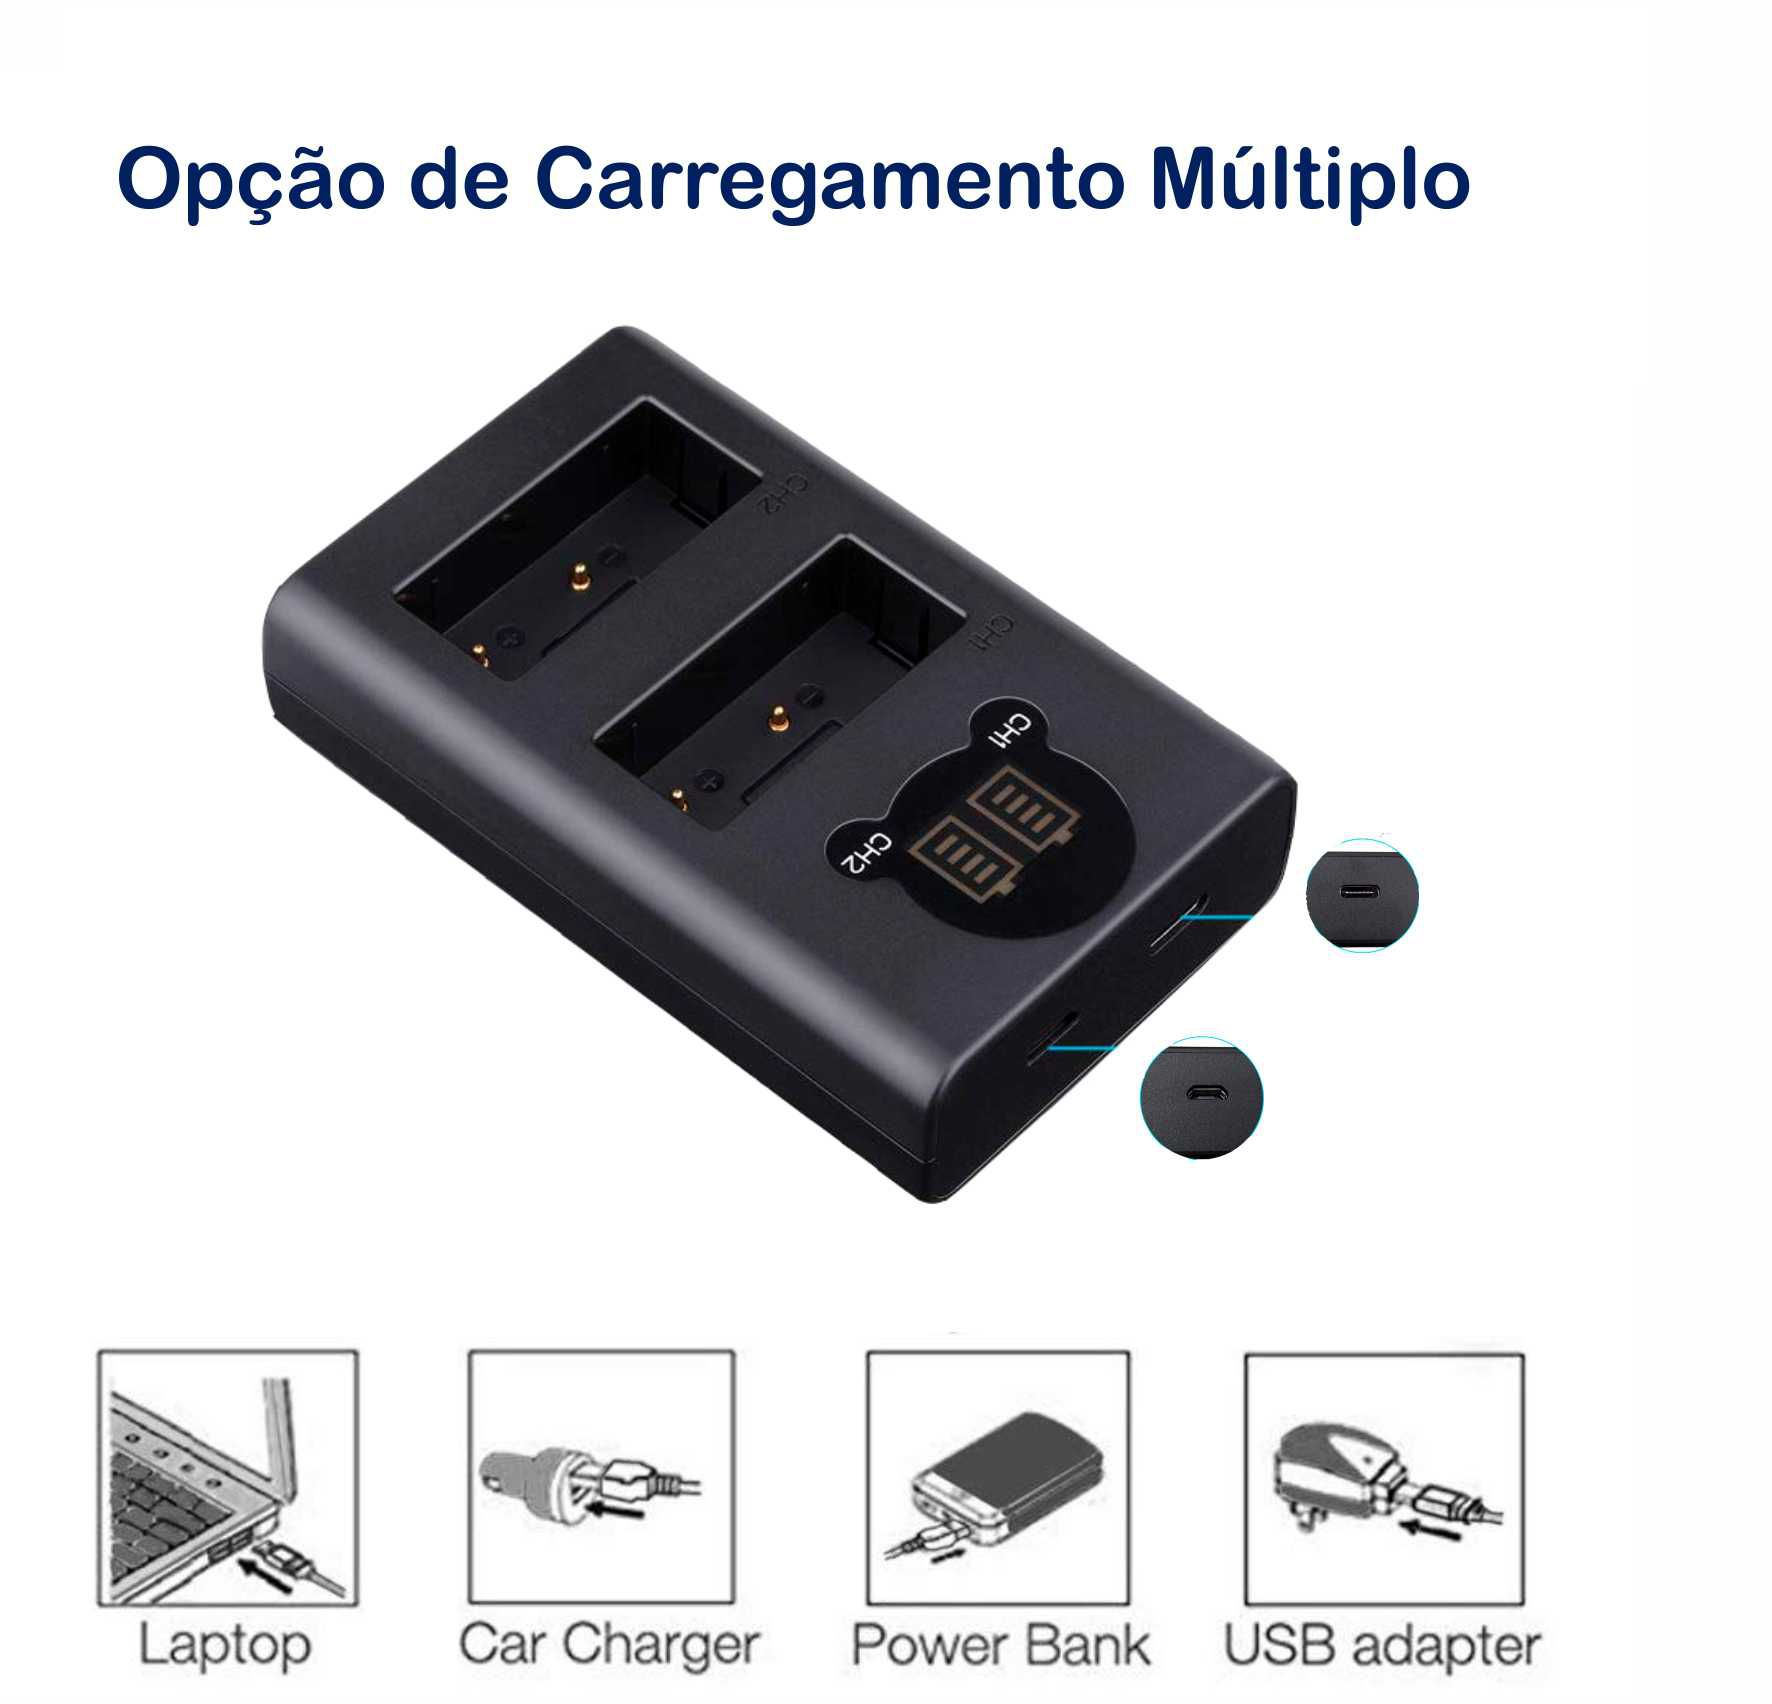 2 BATERIAS + CARREG DUPLO LP-E6 P/ CANON